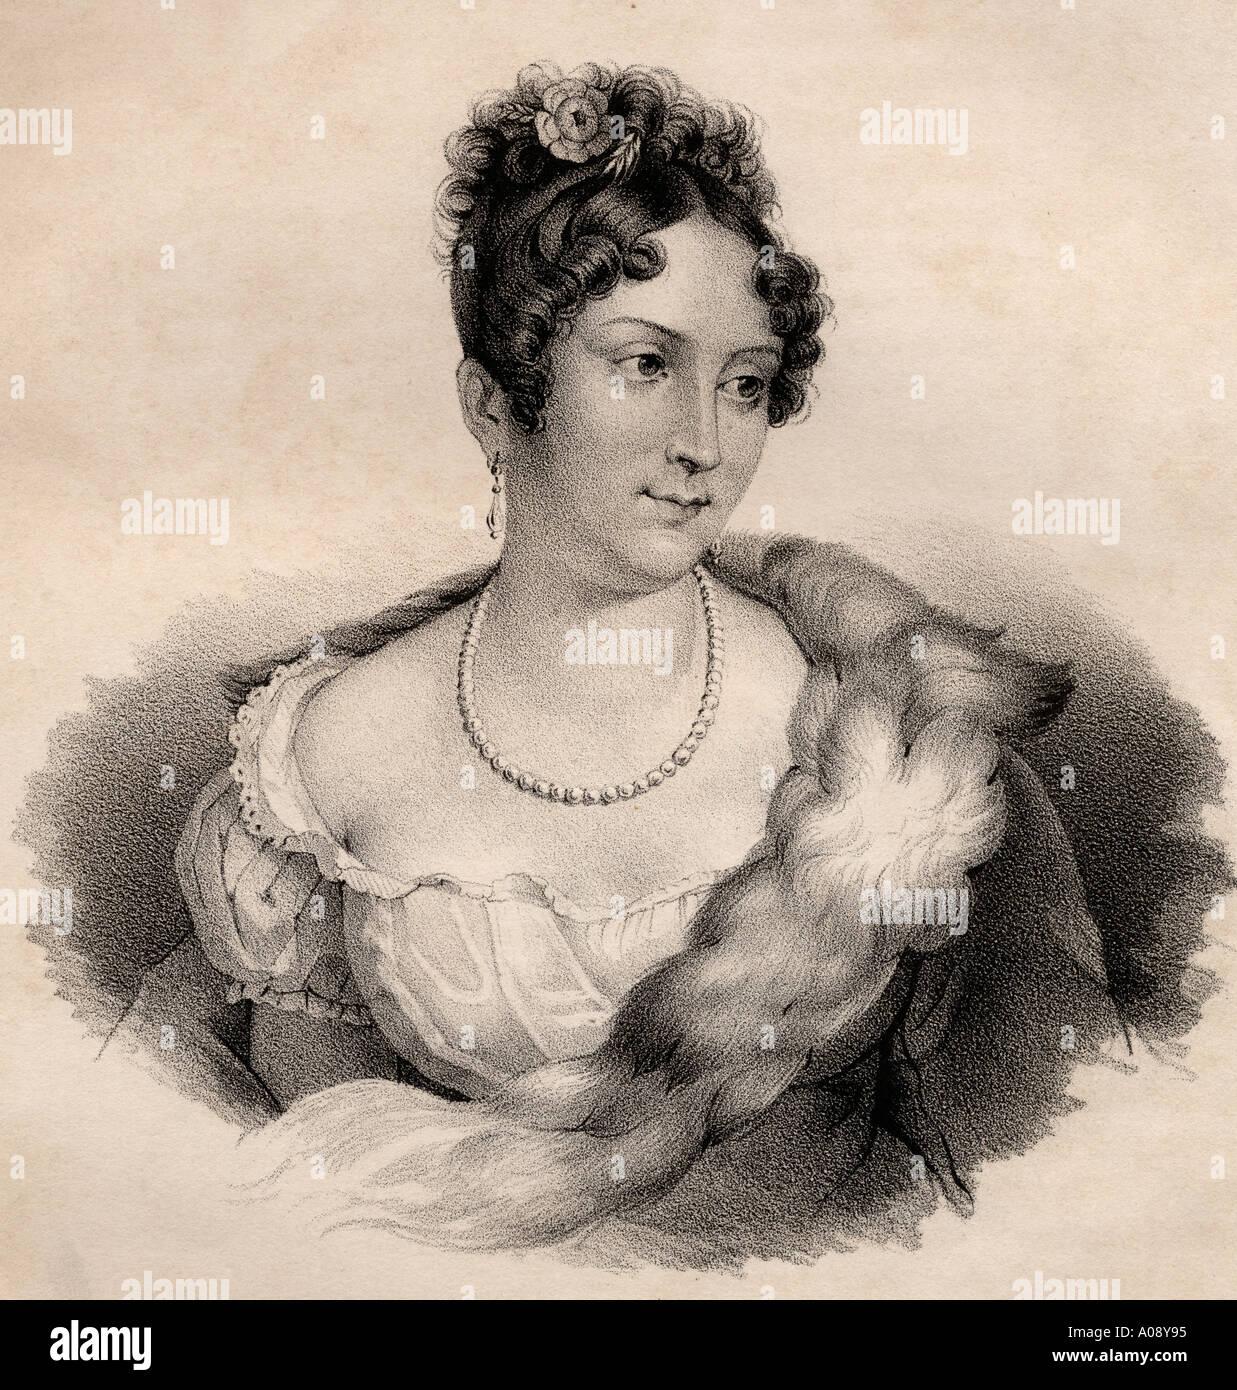 Mademoiselle Mars, (Anne Françoise Hyppolyte Boutet Salvetat)) 1779 -1847.  French actress at the Comédie Française - Stock Image